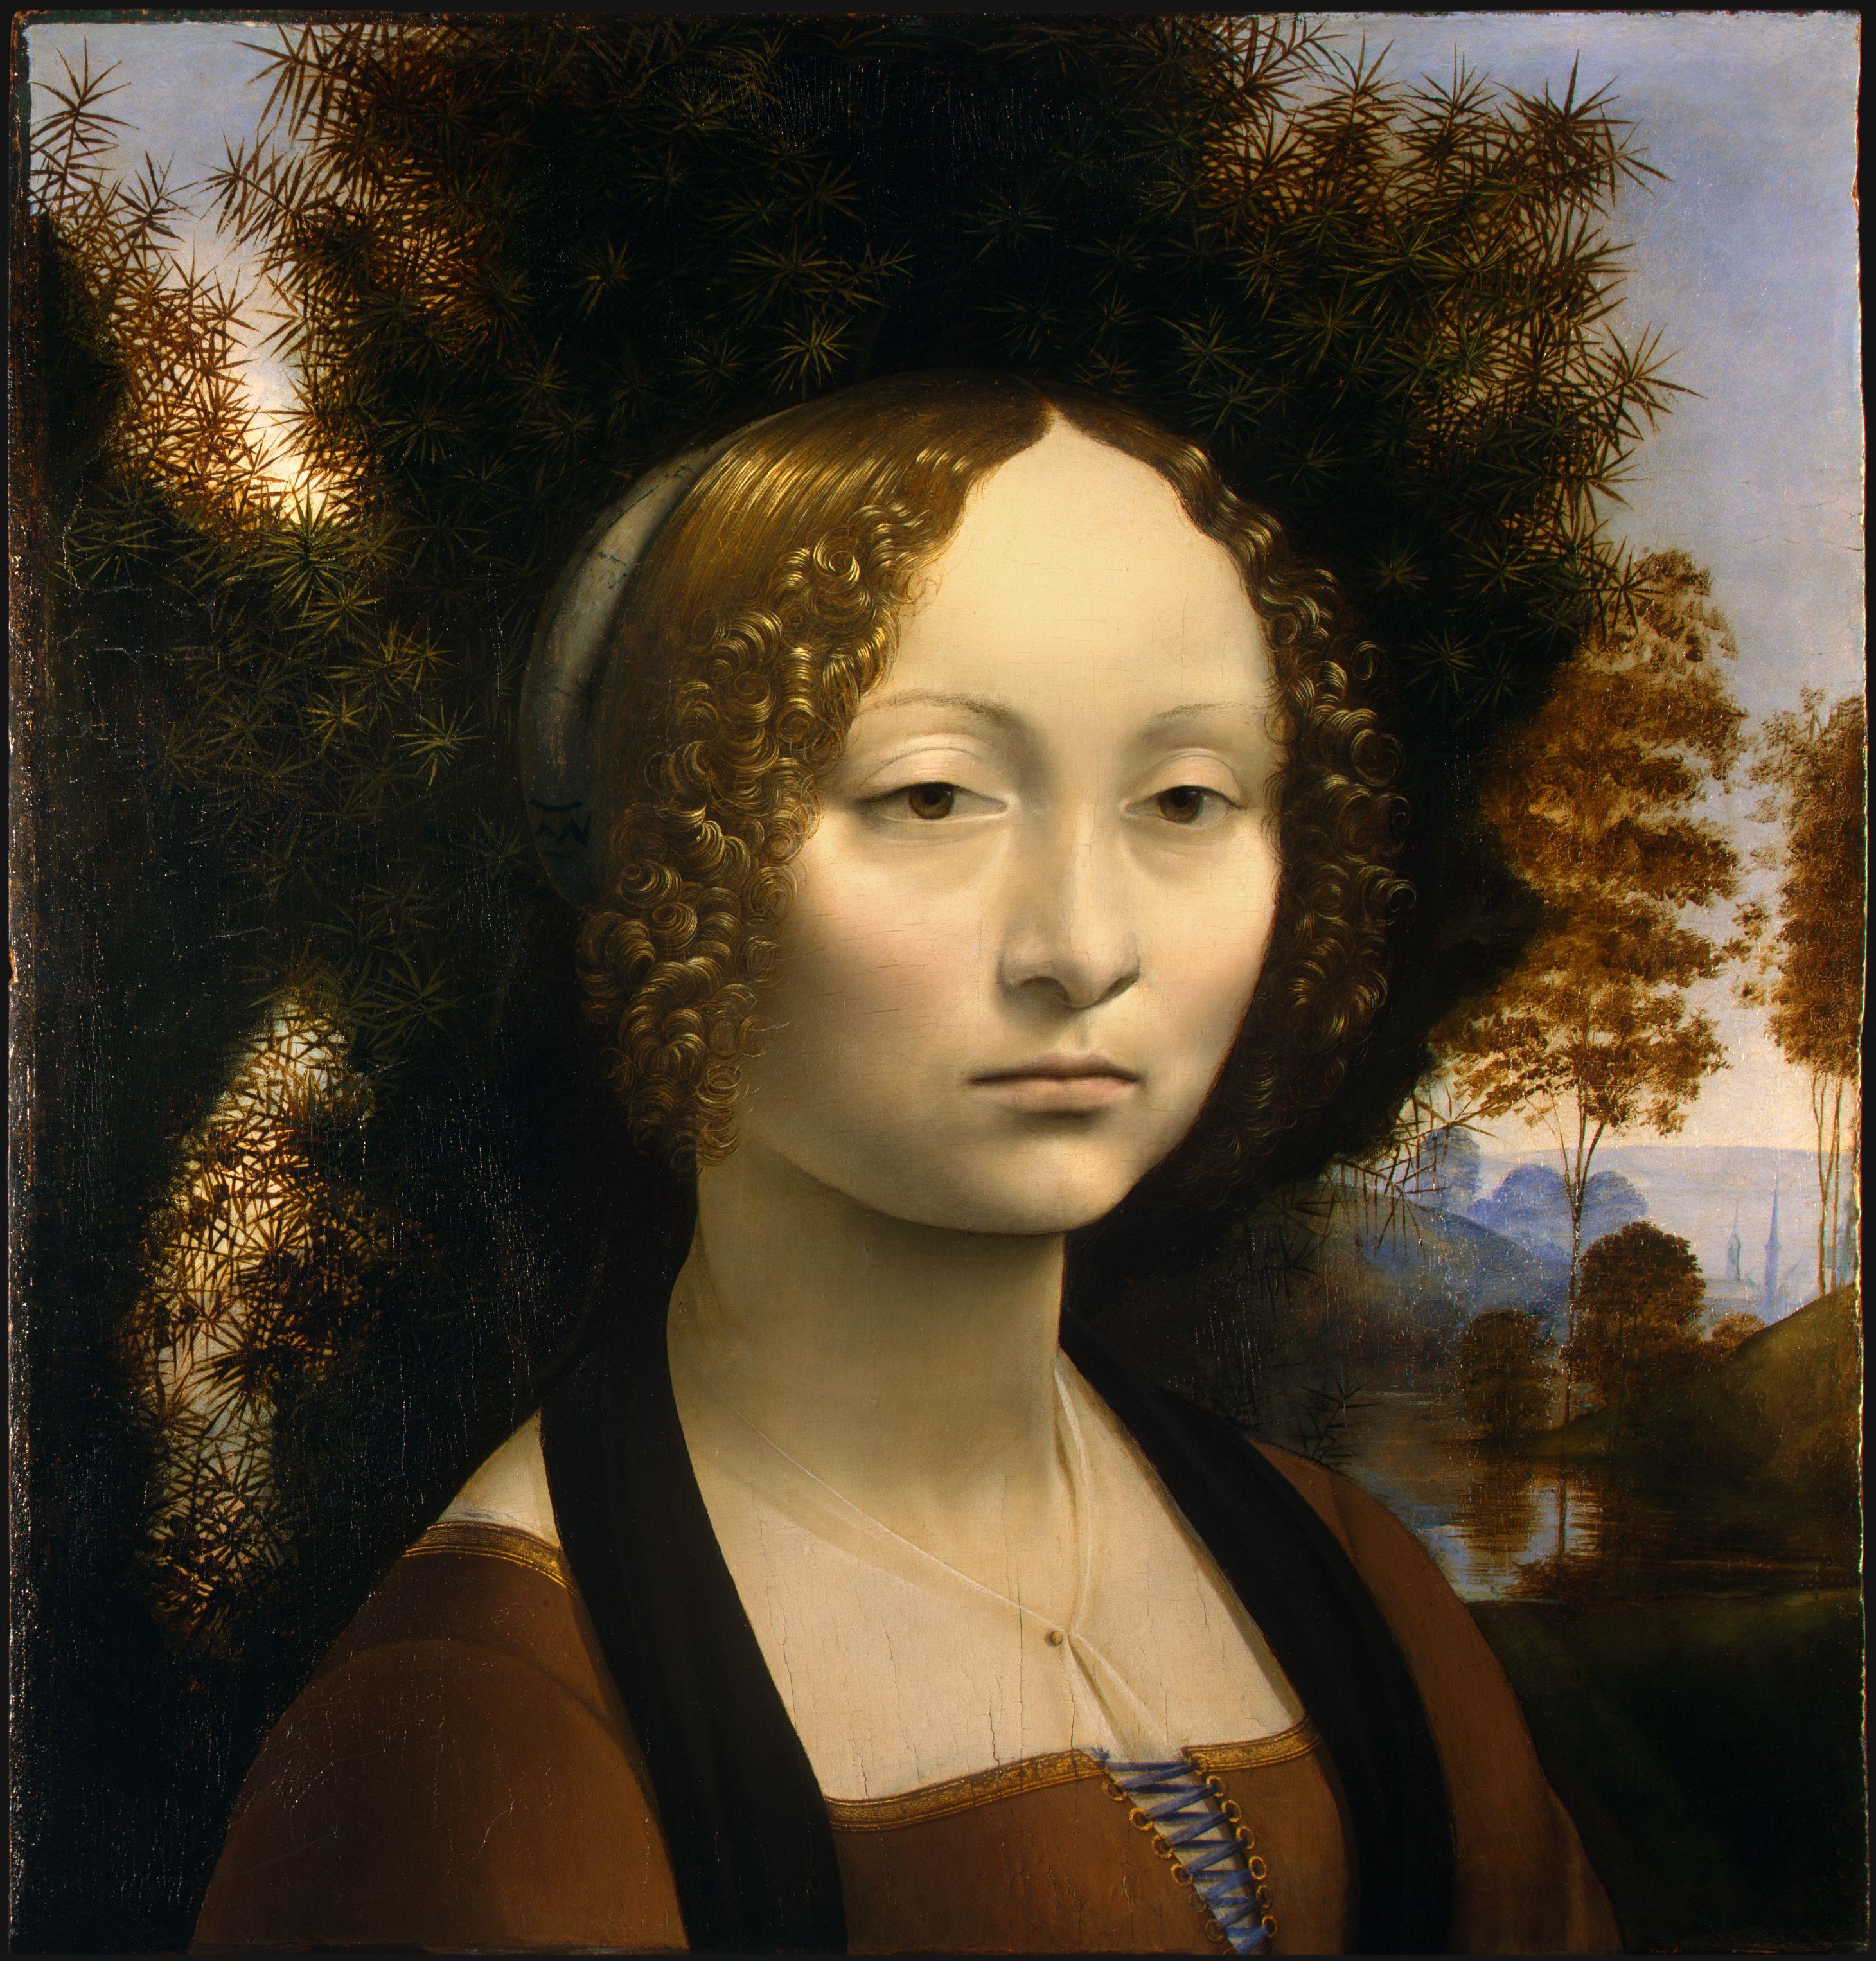 http://upload.wikimedia.org/wikipedia/commons/6/6f/Leonardo_da_Vinci,_Ginevra_de%27_Benci,_1474-78.png